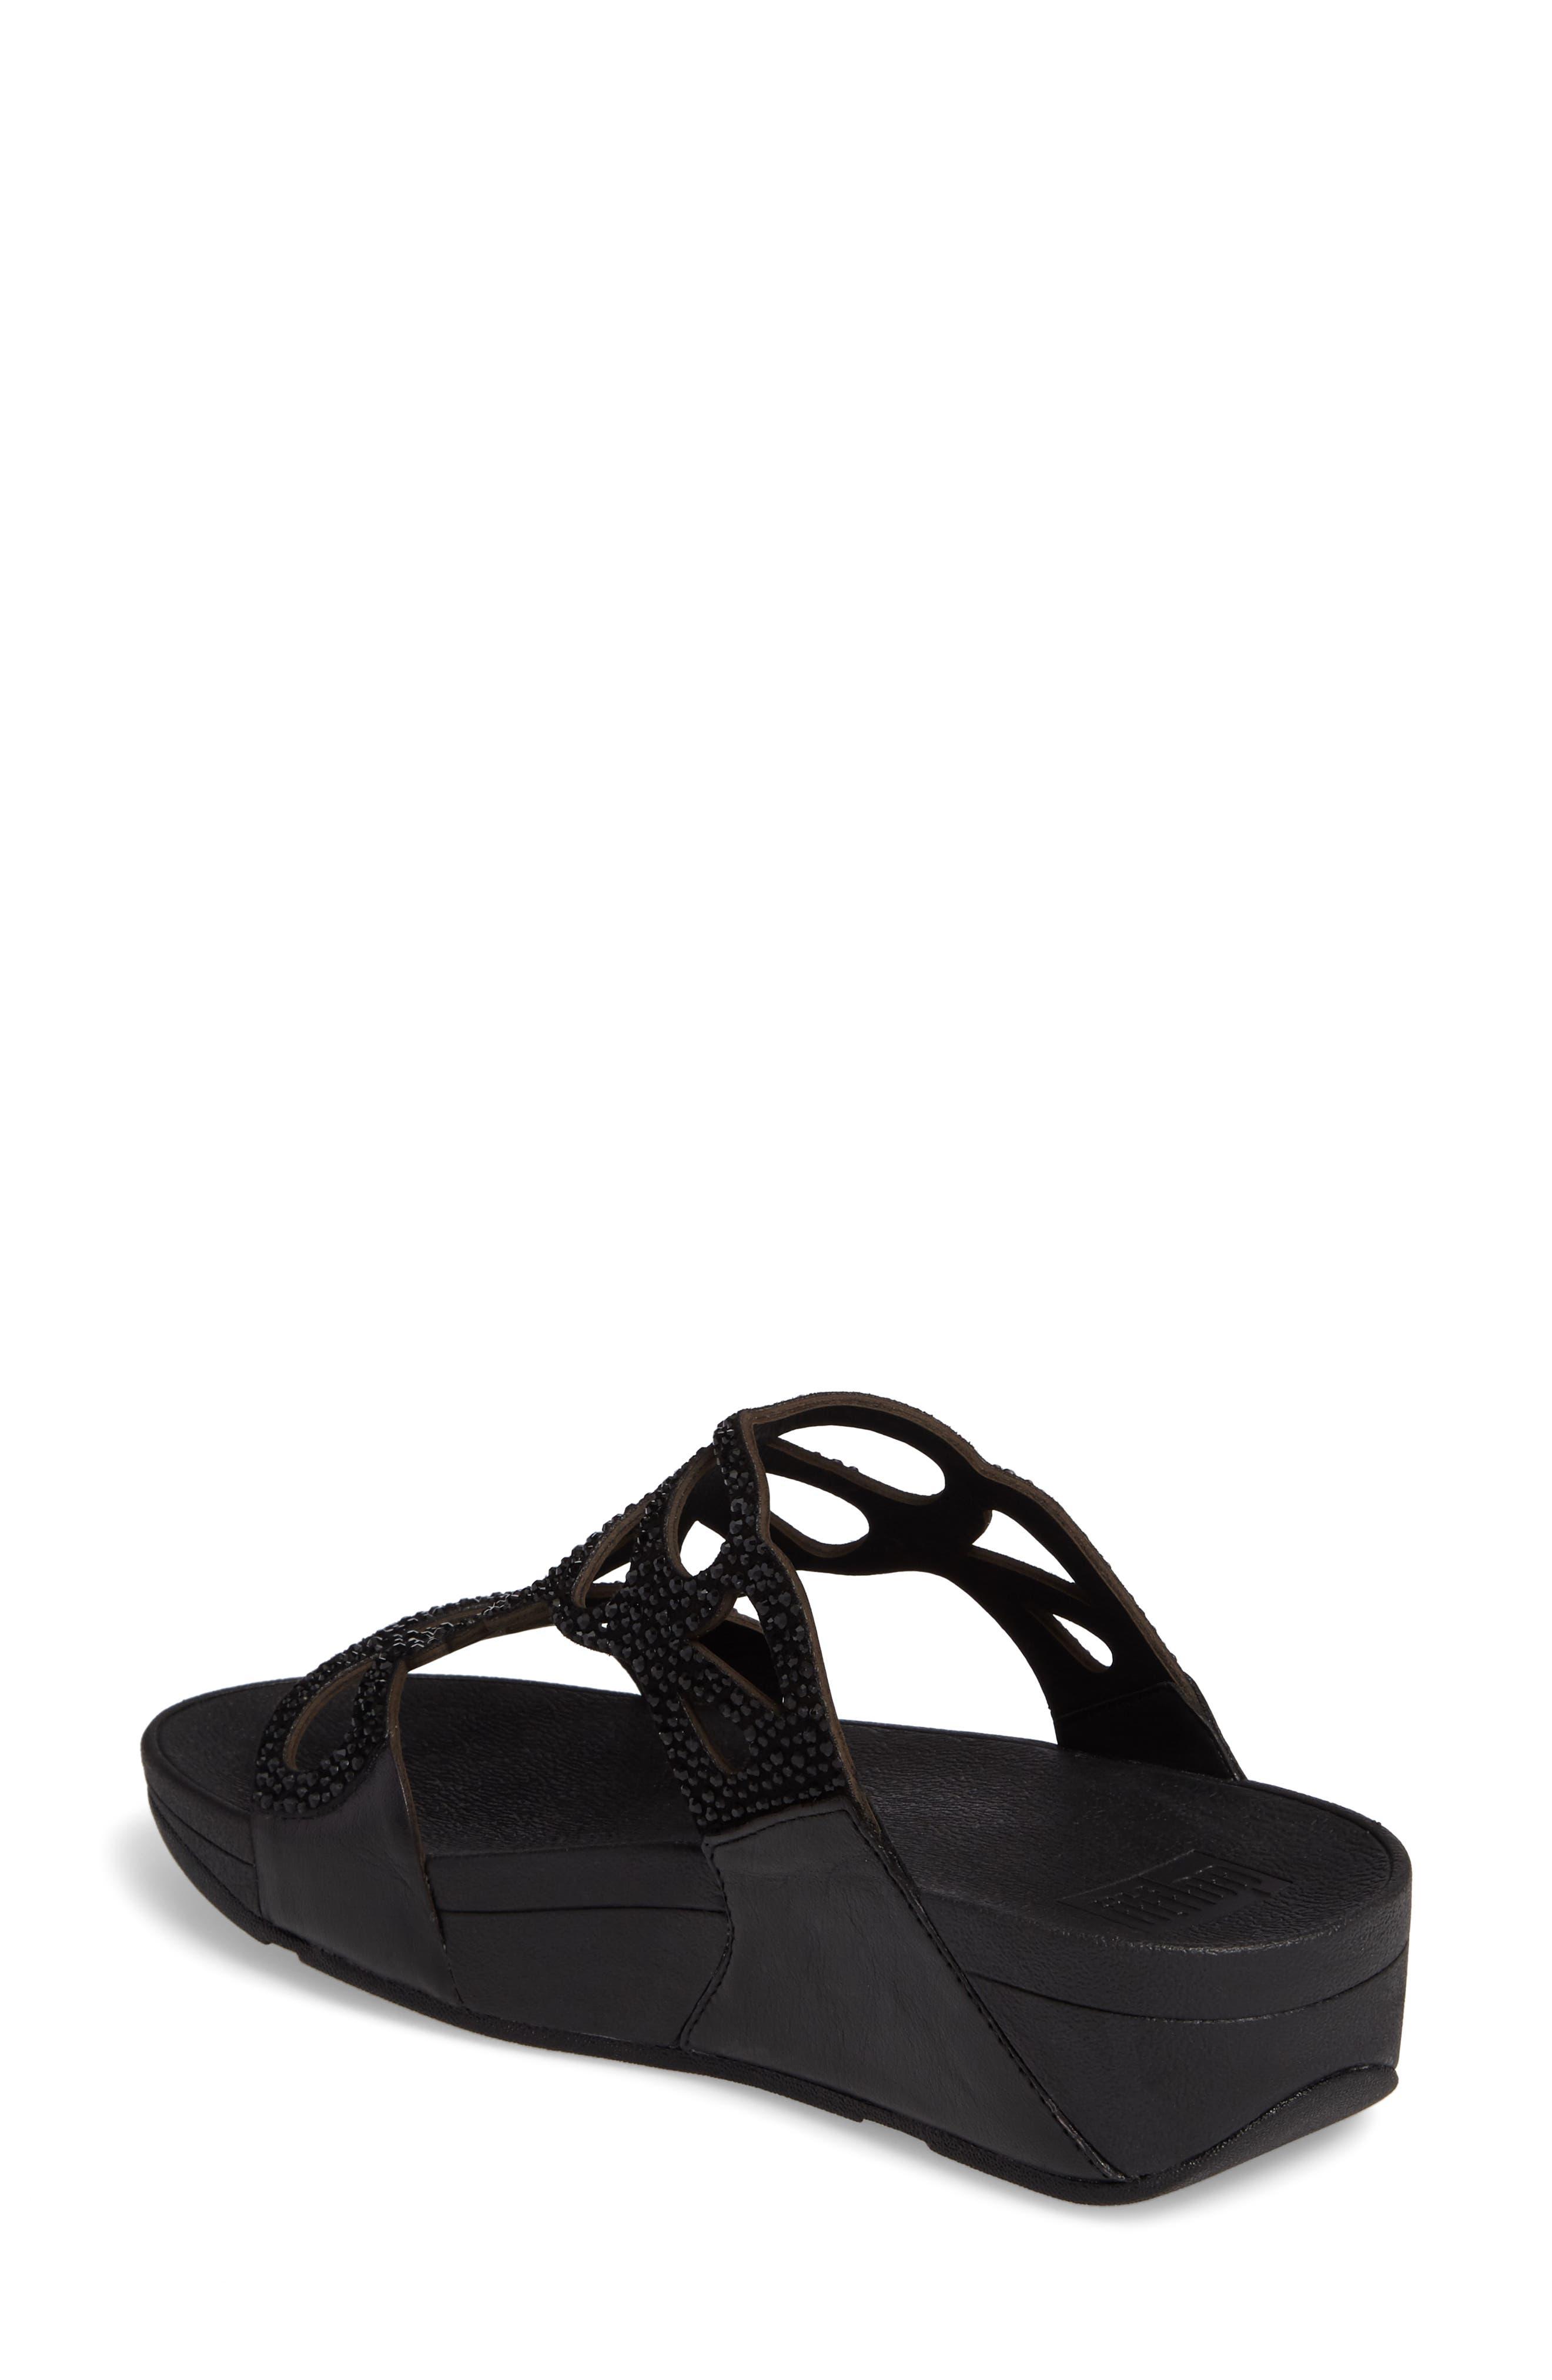 Bumble Wedge Slide Sandal,                             Alternate thumbnail 2, color,                             Black Leather